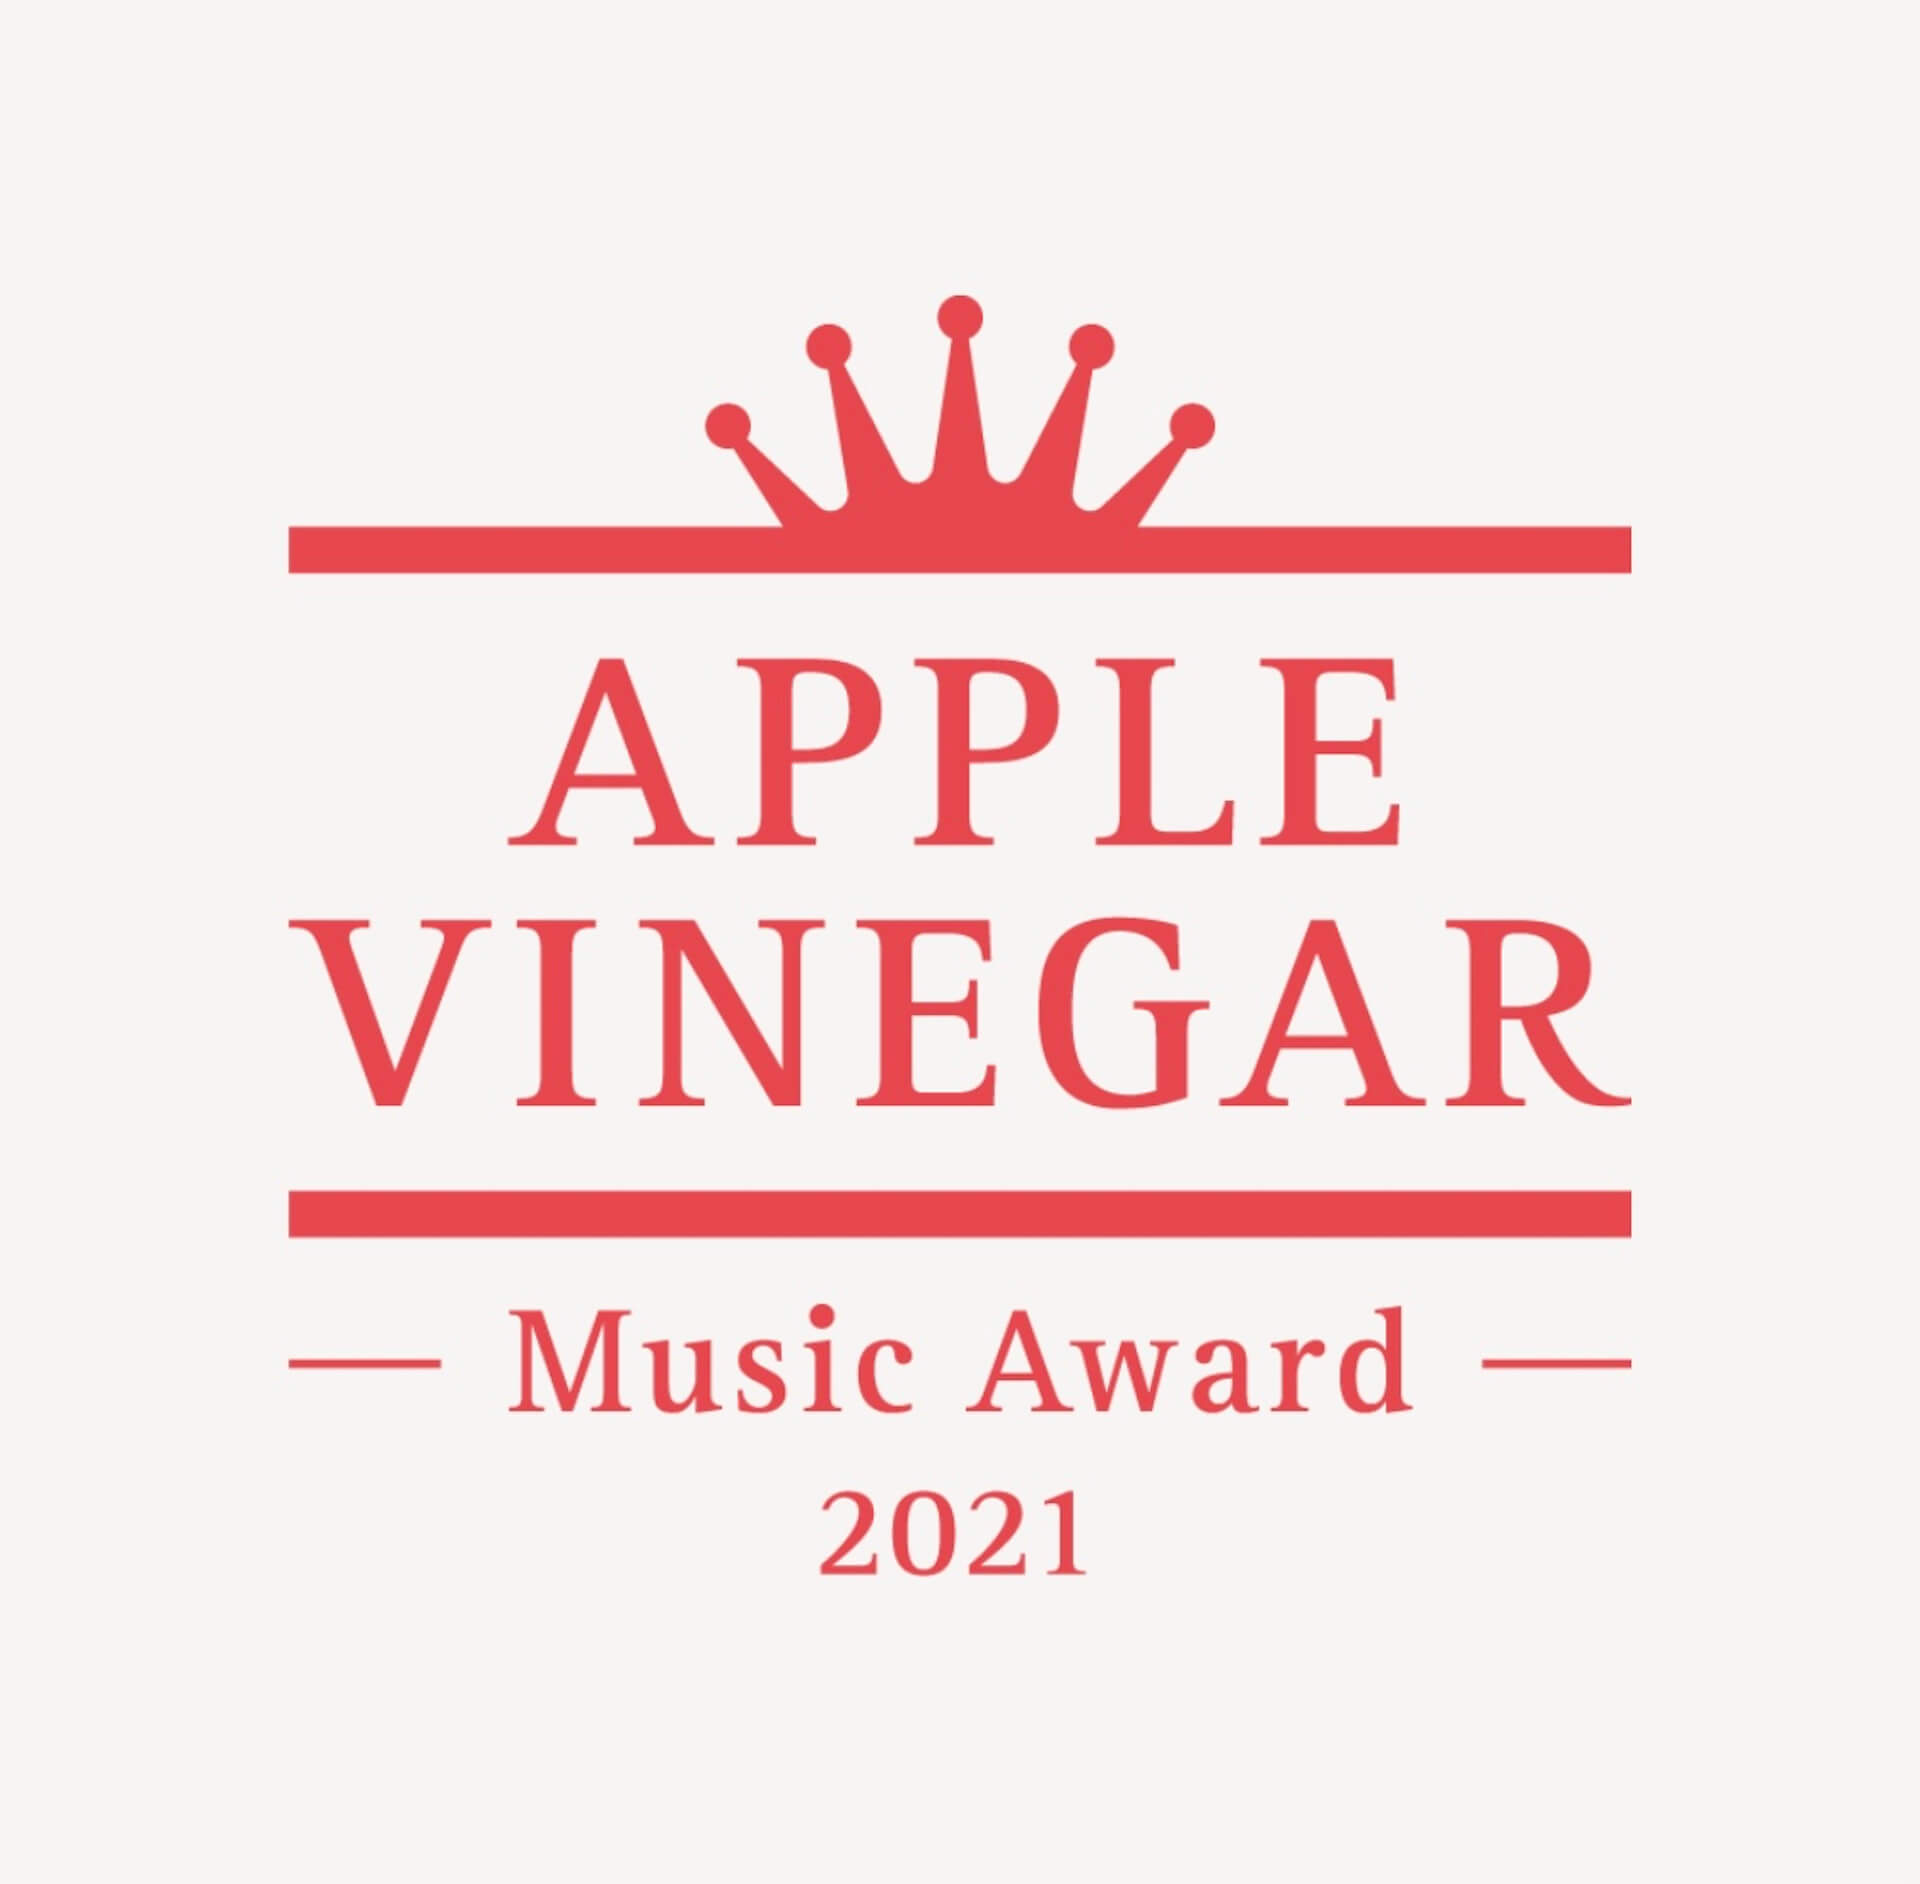 『APPLE VINEGAR -Music Award-』選考会前半の模様が特設サイトで公開中!Green Assassin Dollar、BIM、 LEX、ゆうらん船、角銅真実の5作品を紹介 music210402_applevinegar210410_01